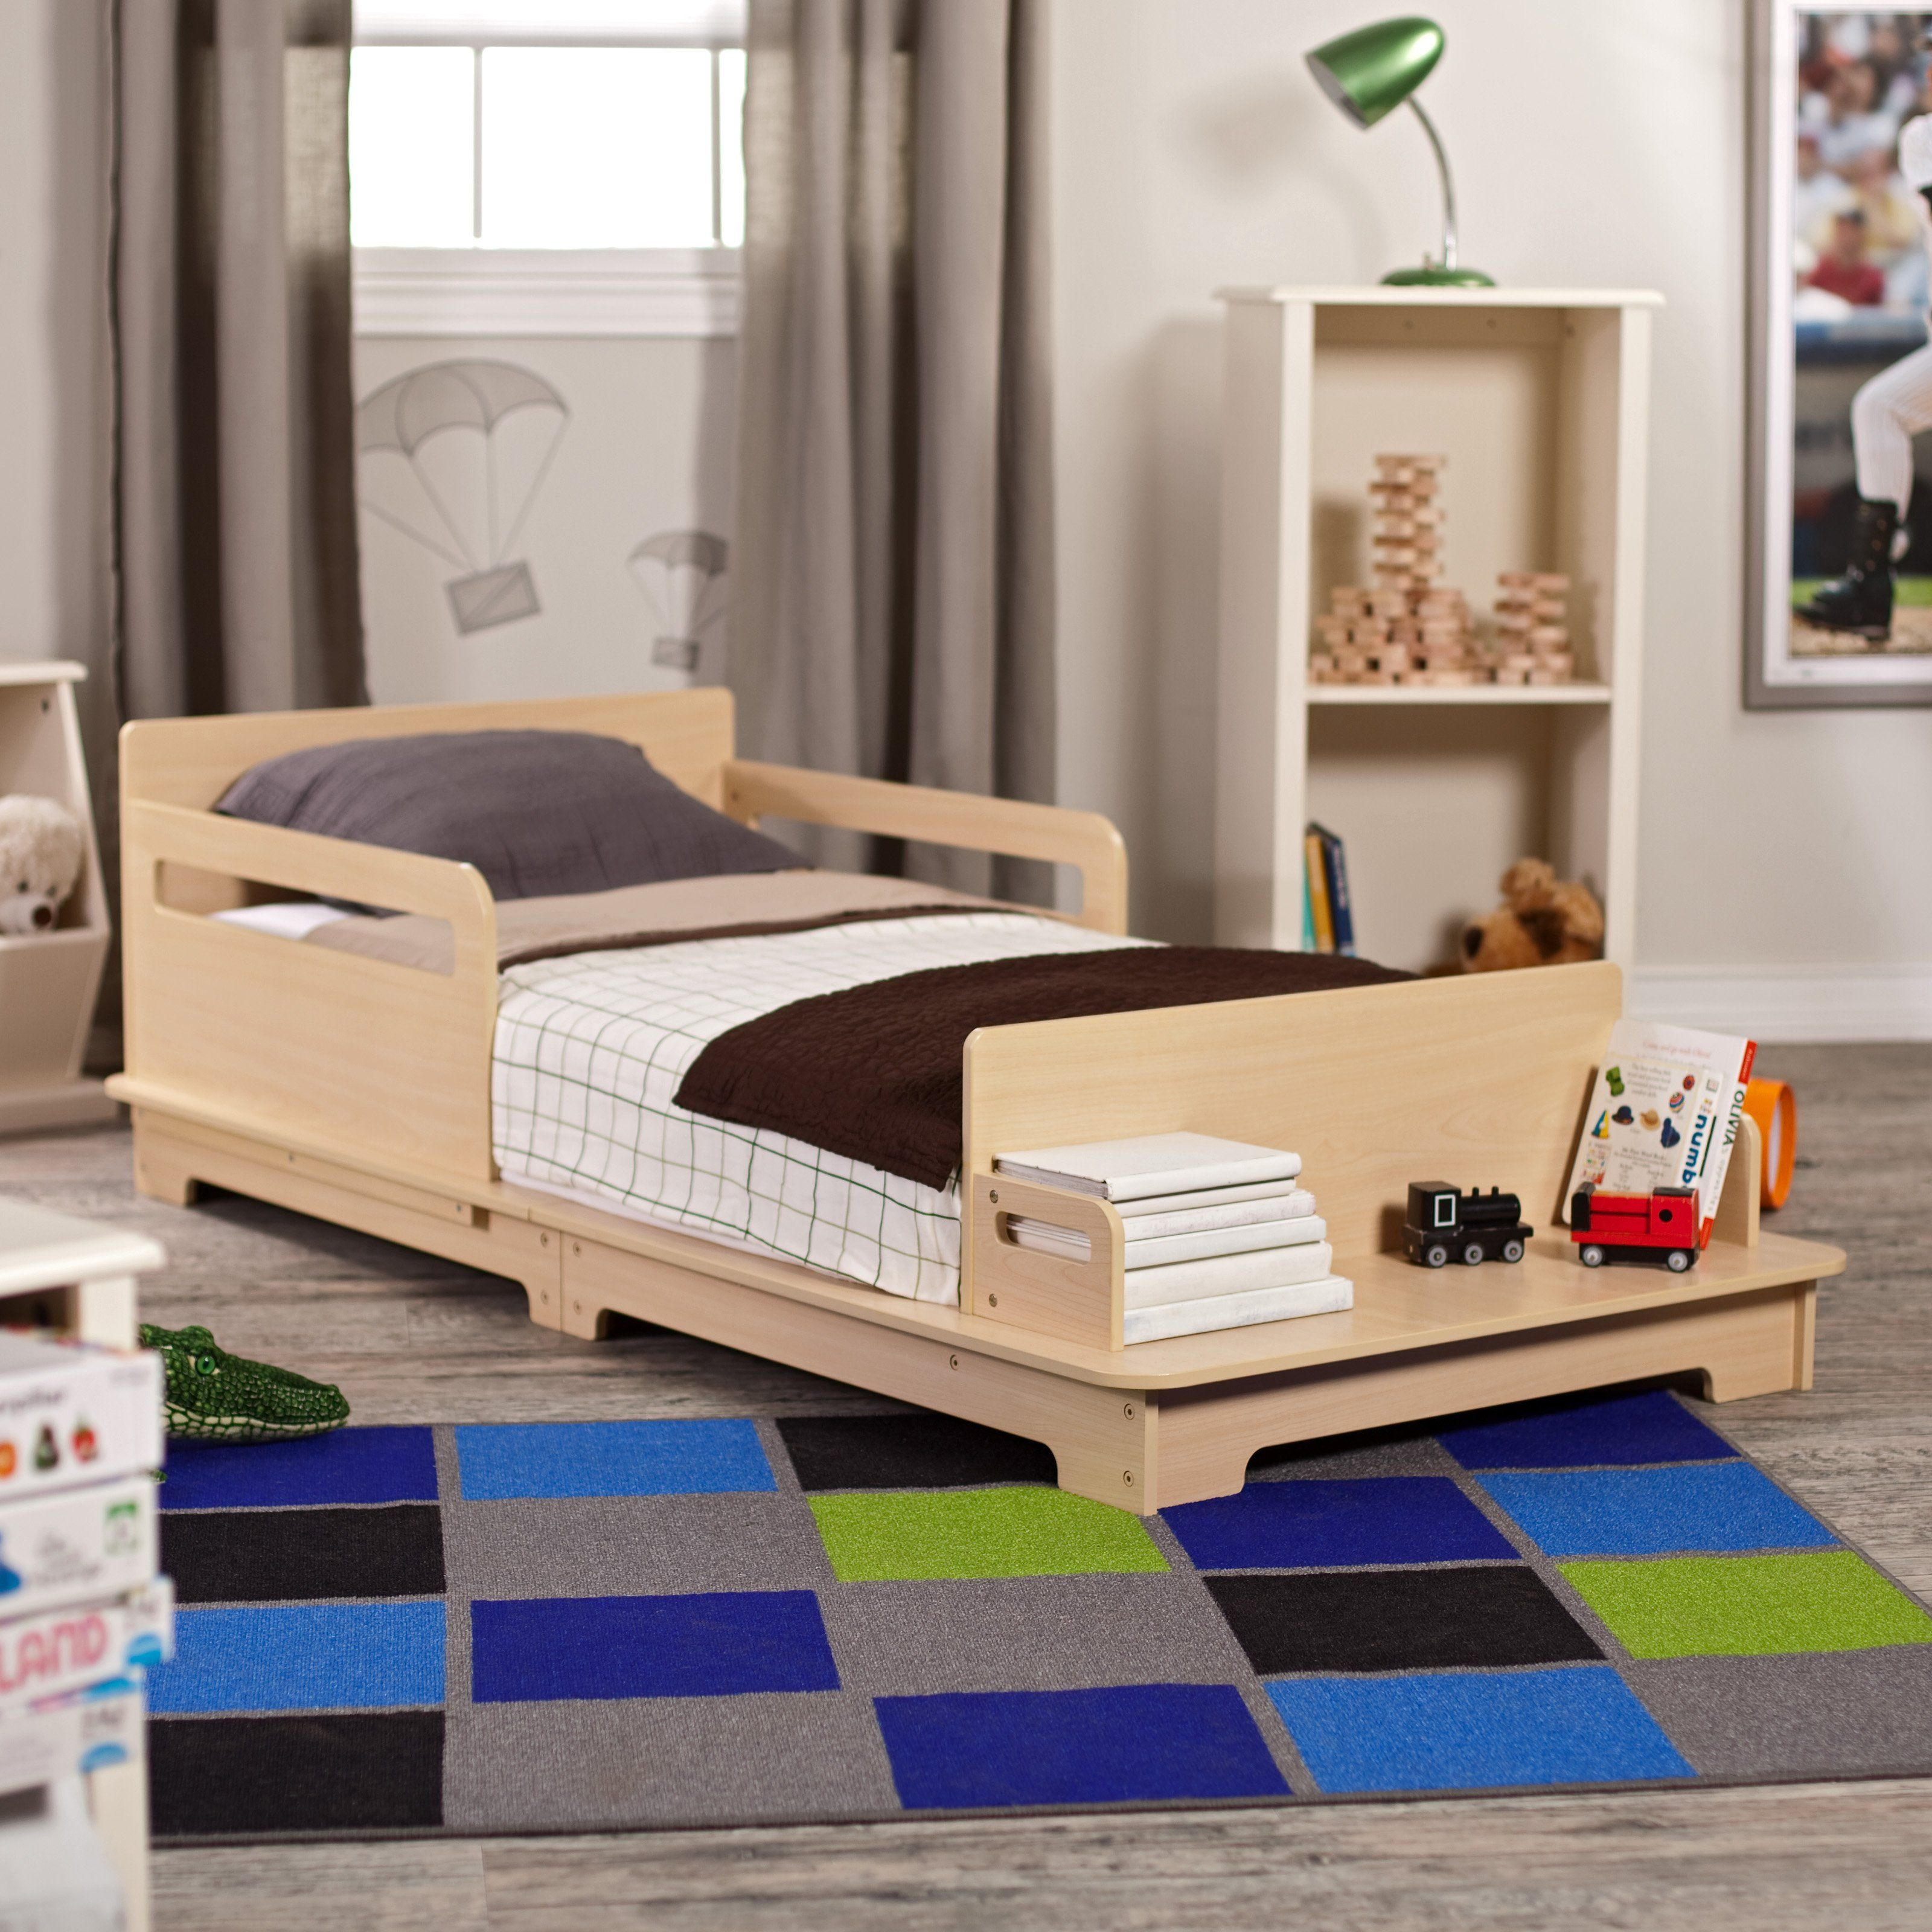 Kidkraft Modern Toddler Bed Www Hayneedle Com Cool Toddler Beds Toddler Bed Set Modern Toddler Bed